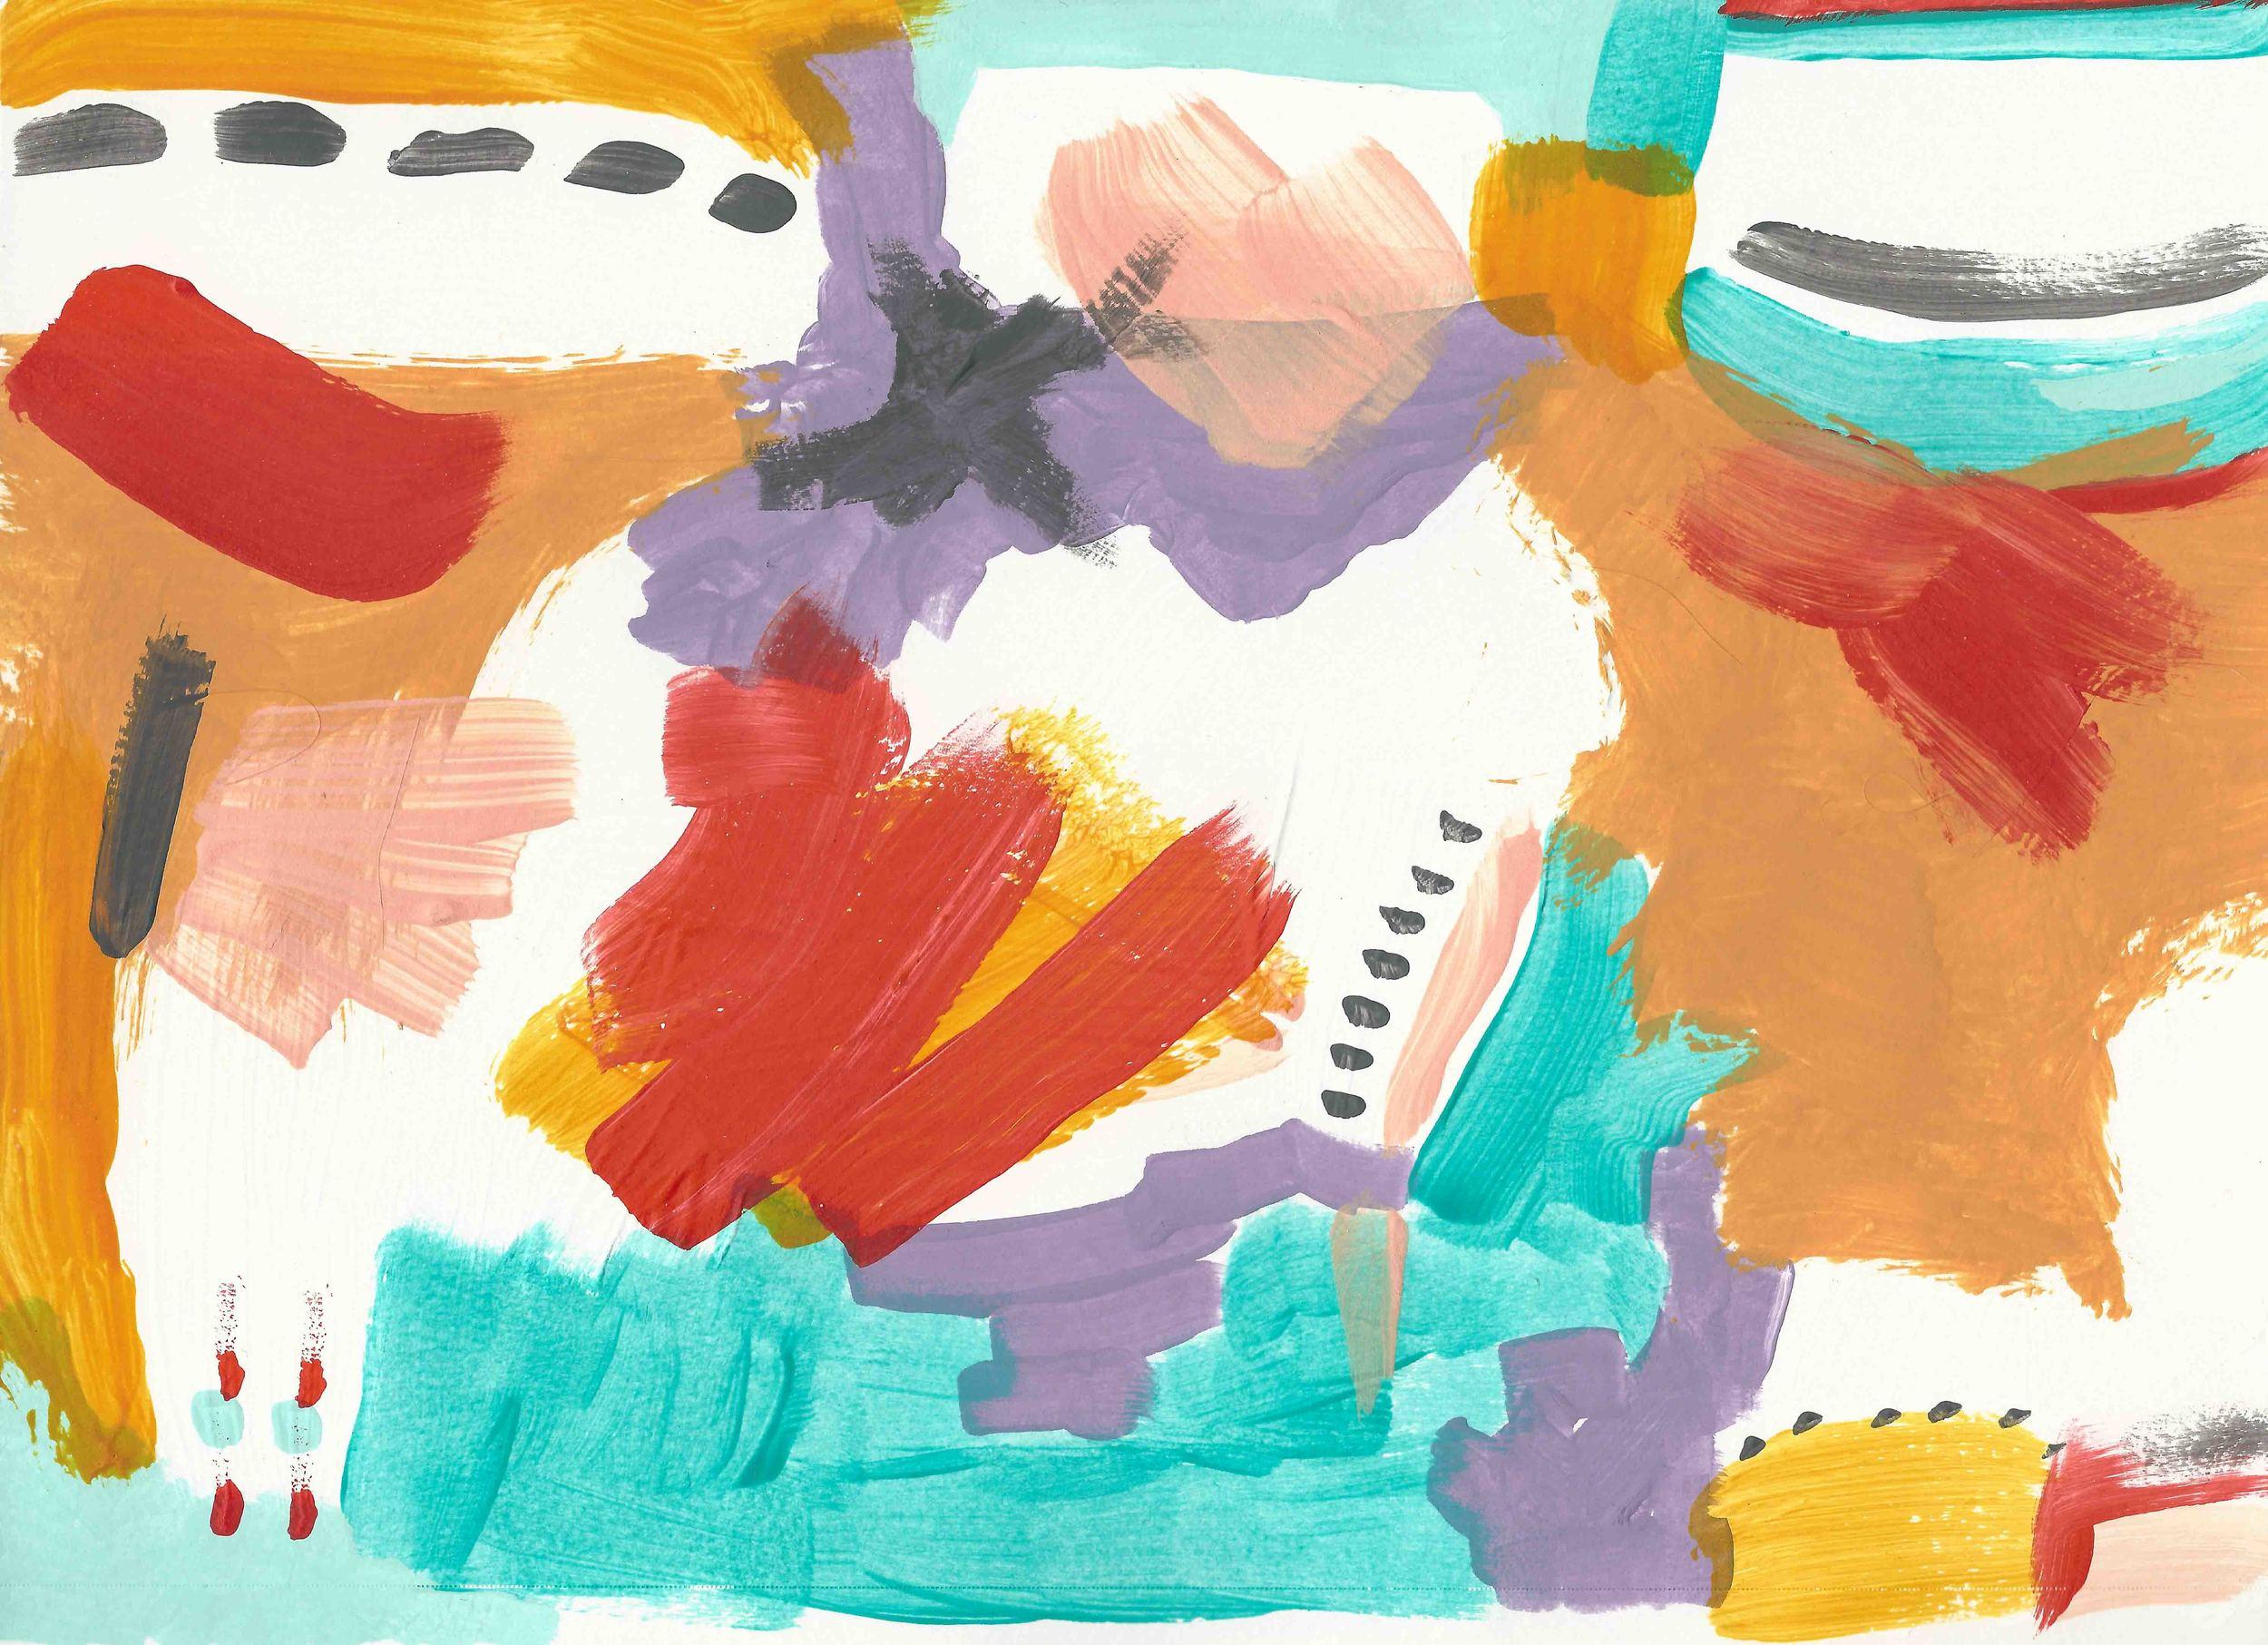 ice cream social 7x10 paper.jpg